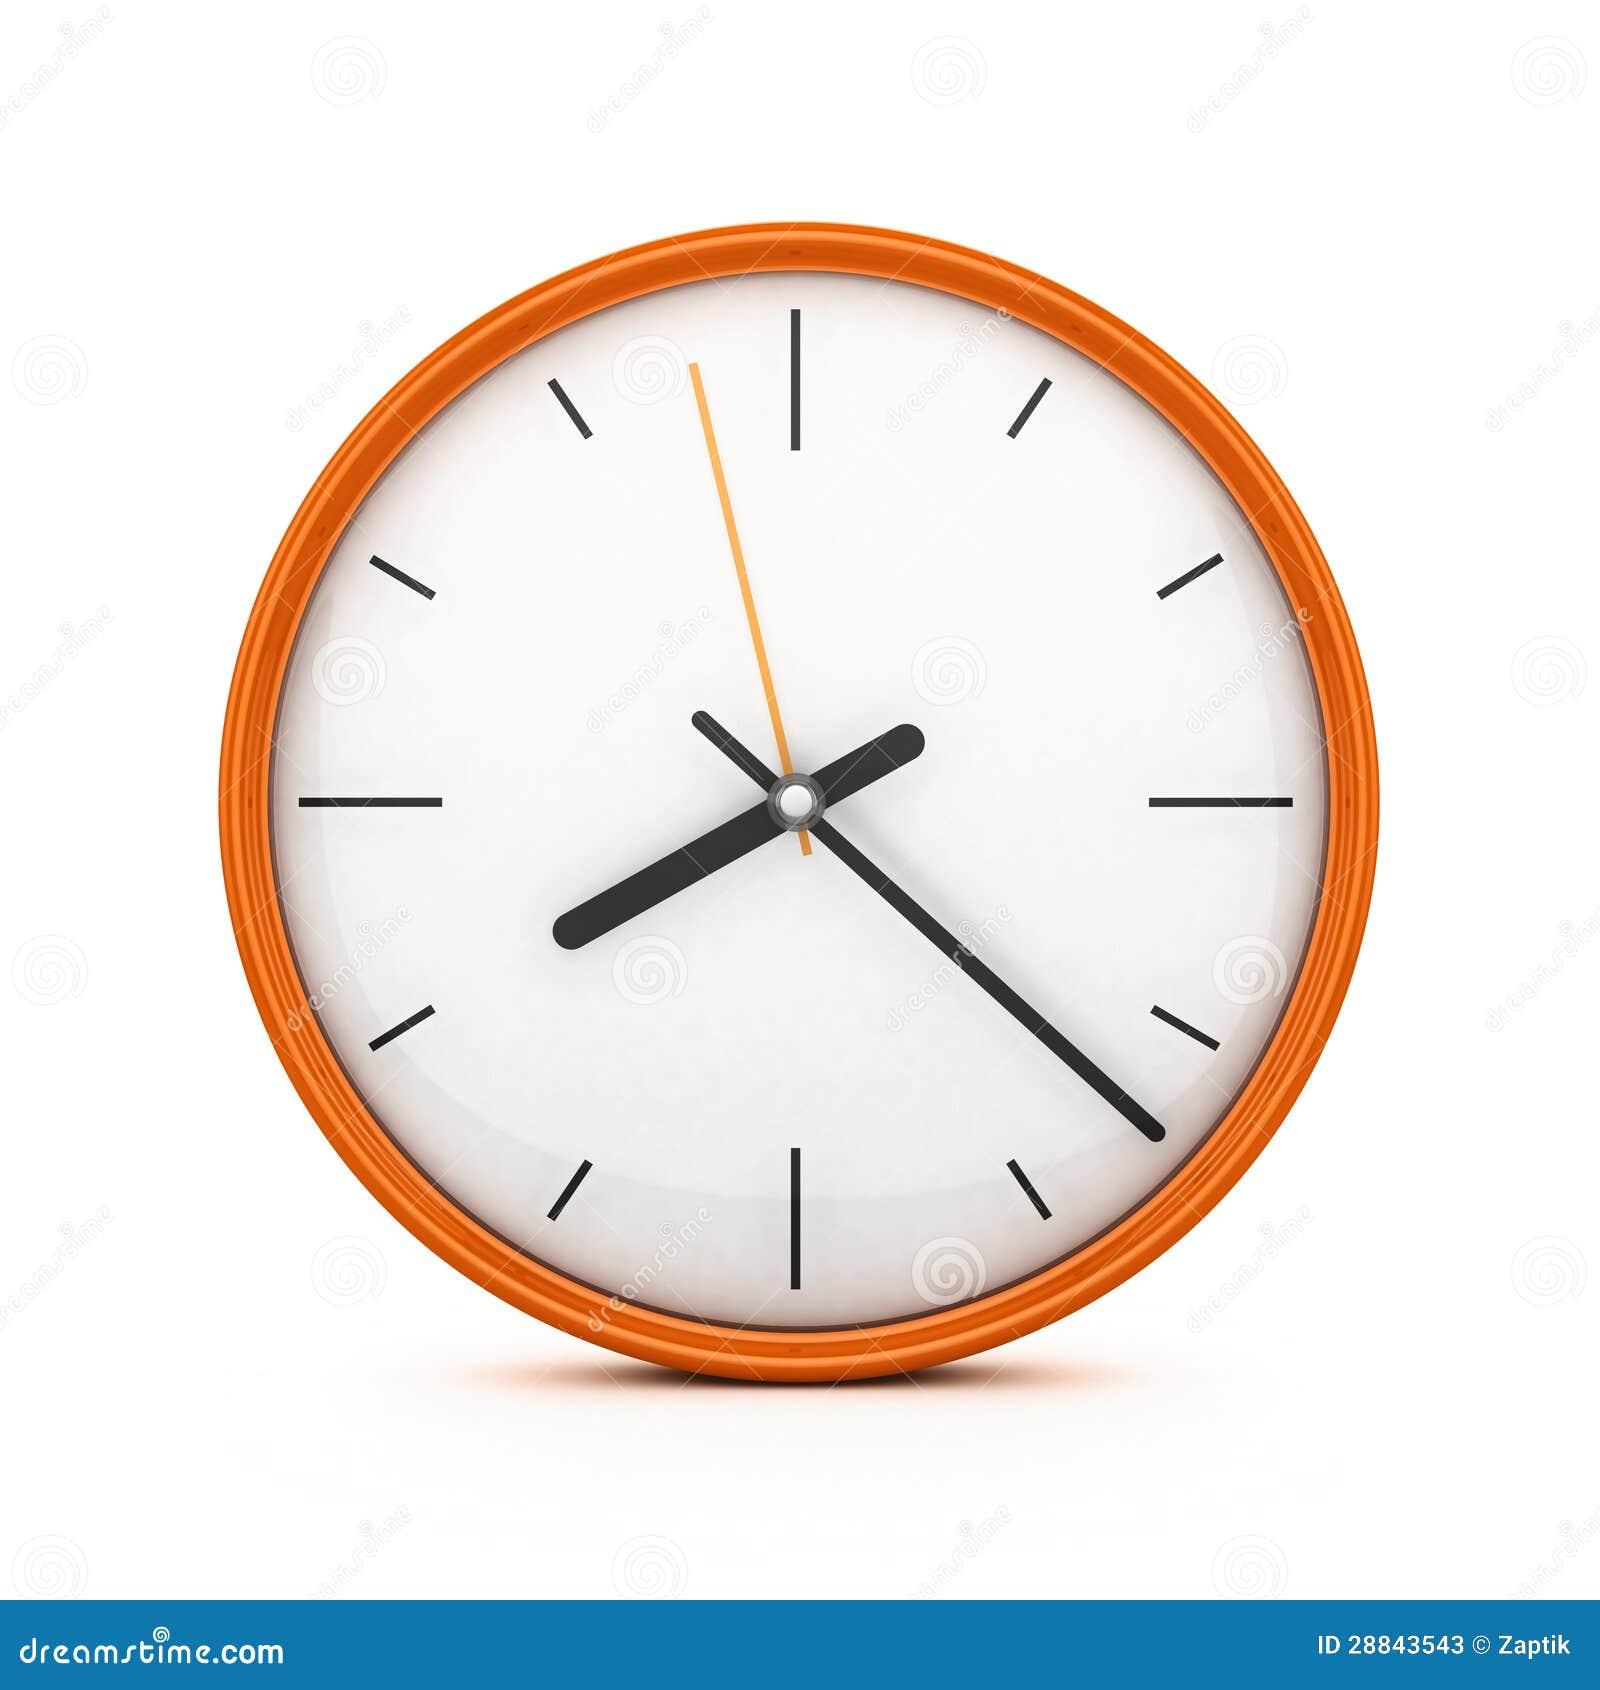 3D Orange Clock Stock Photos - Image: 28843543